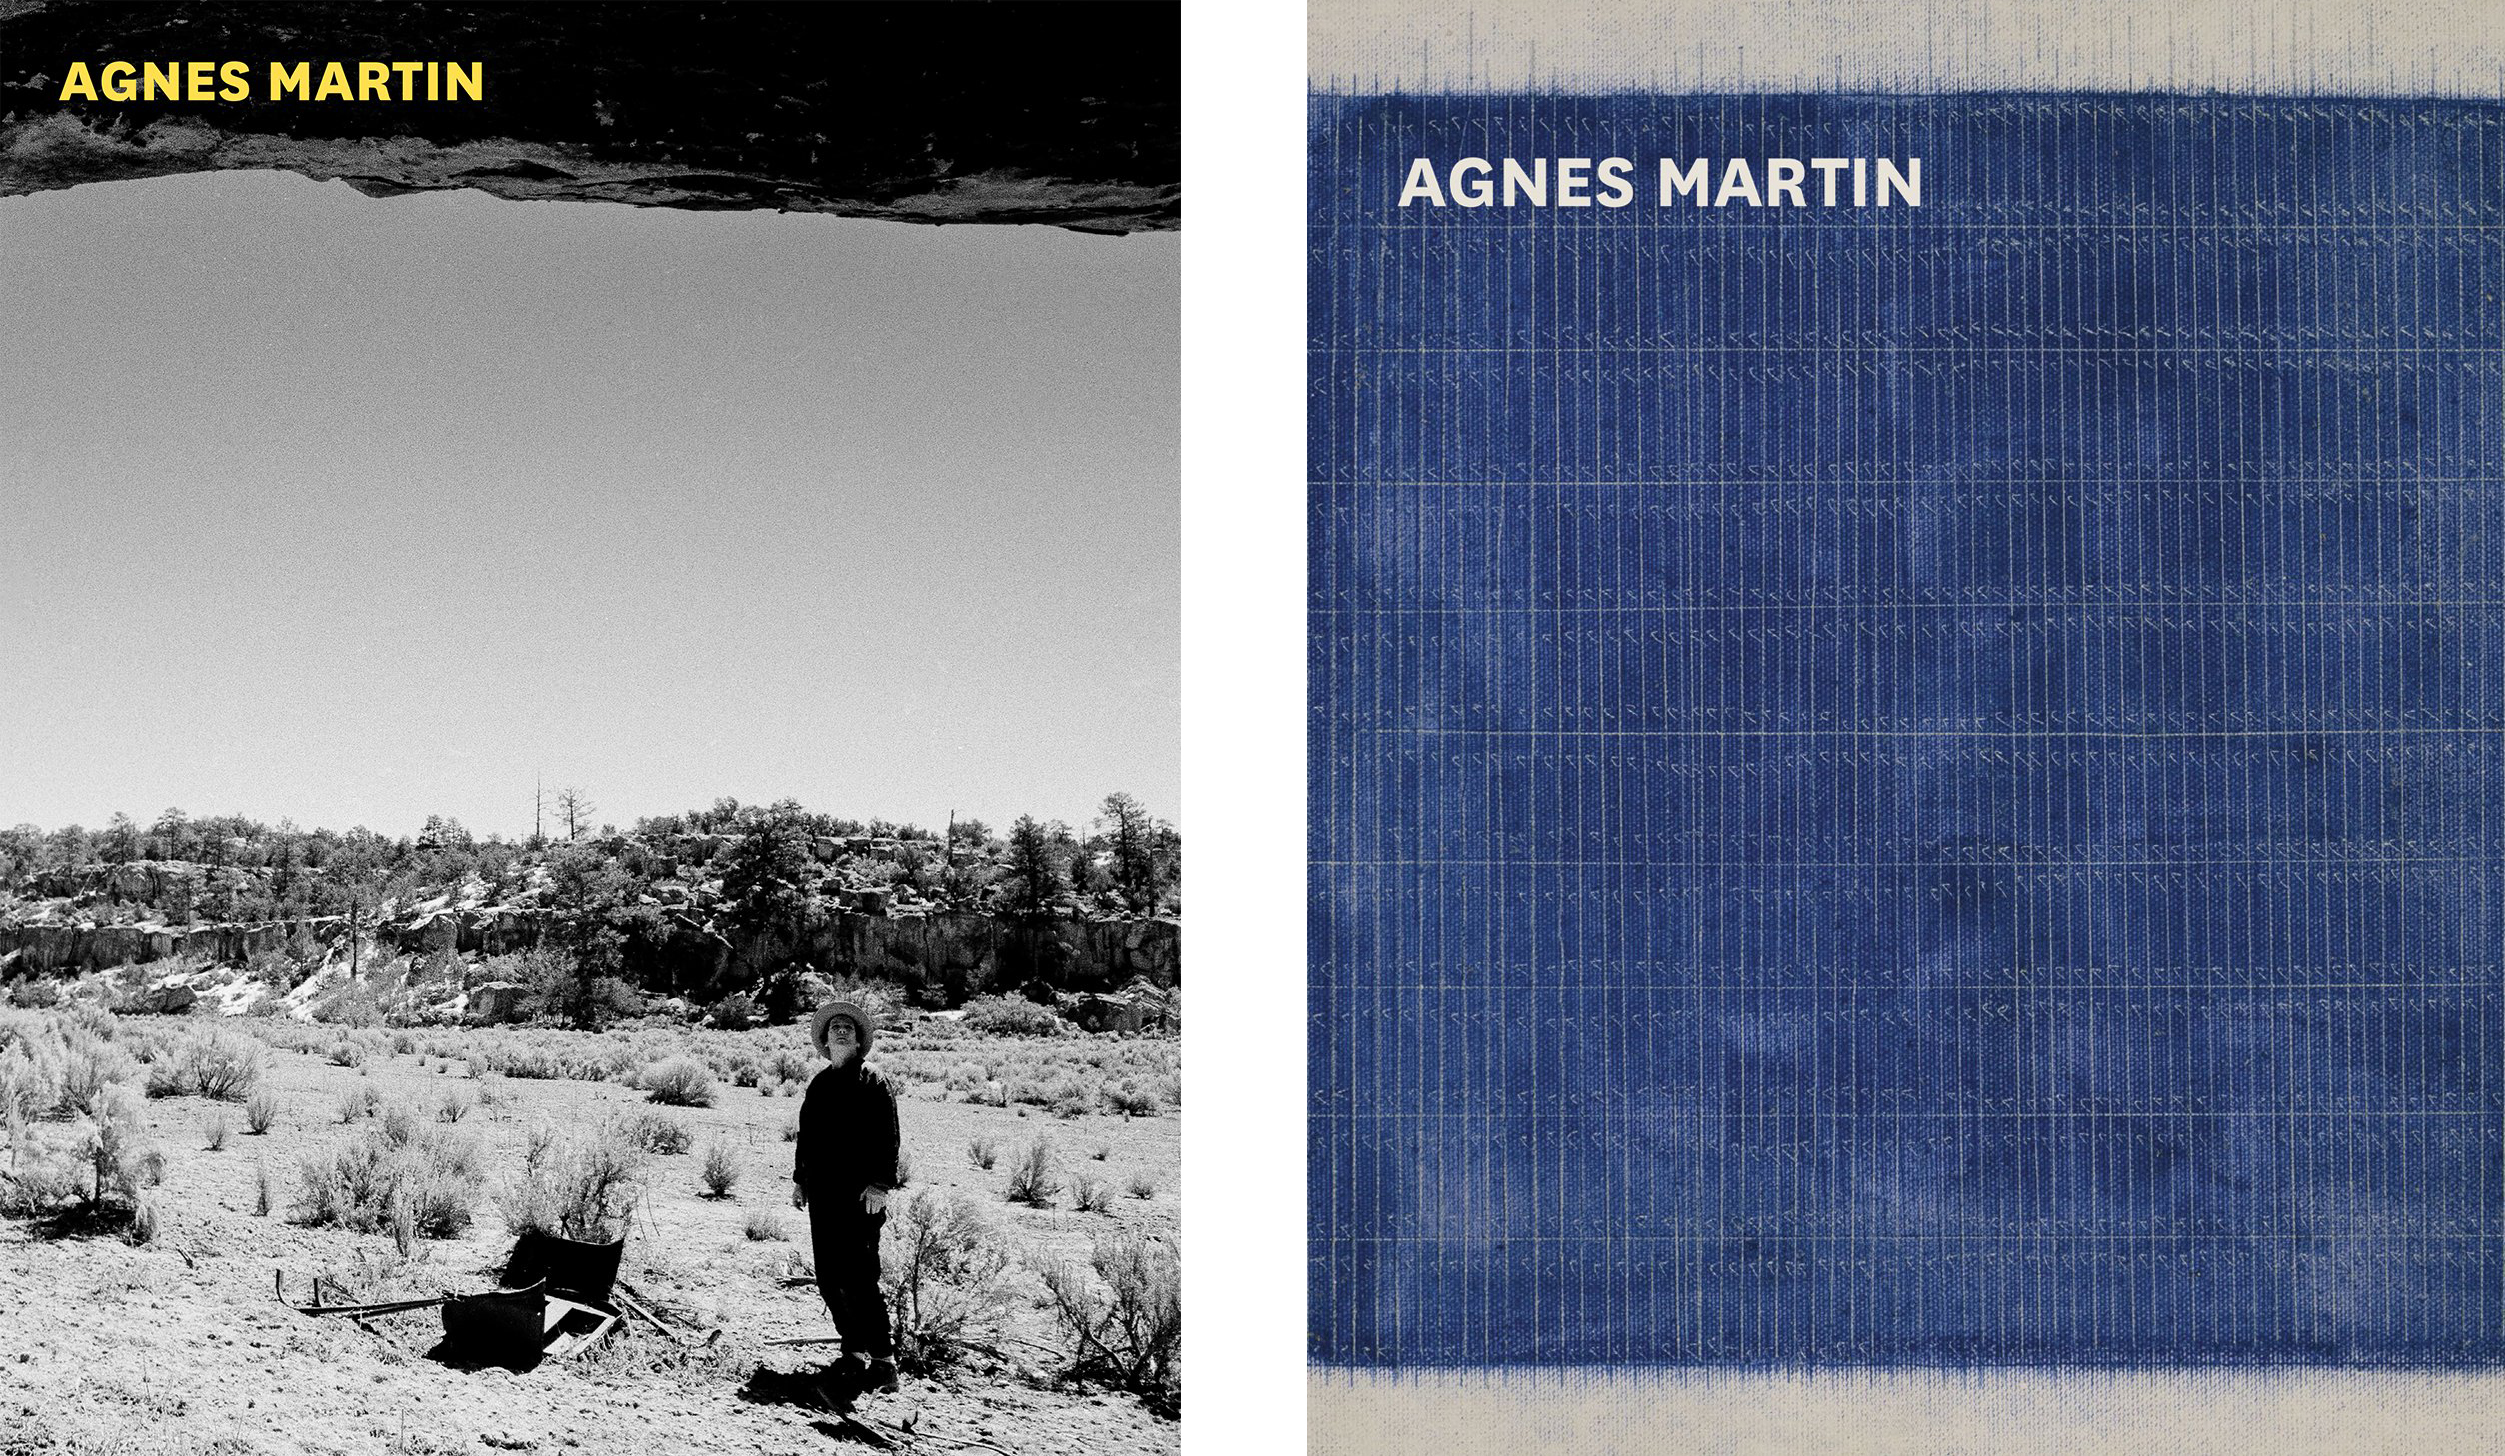 martin_book_covers.jpg